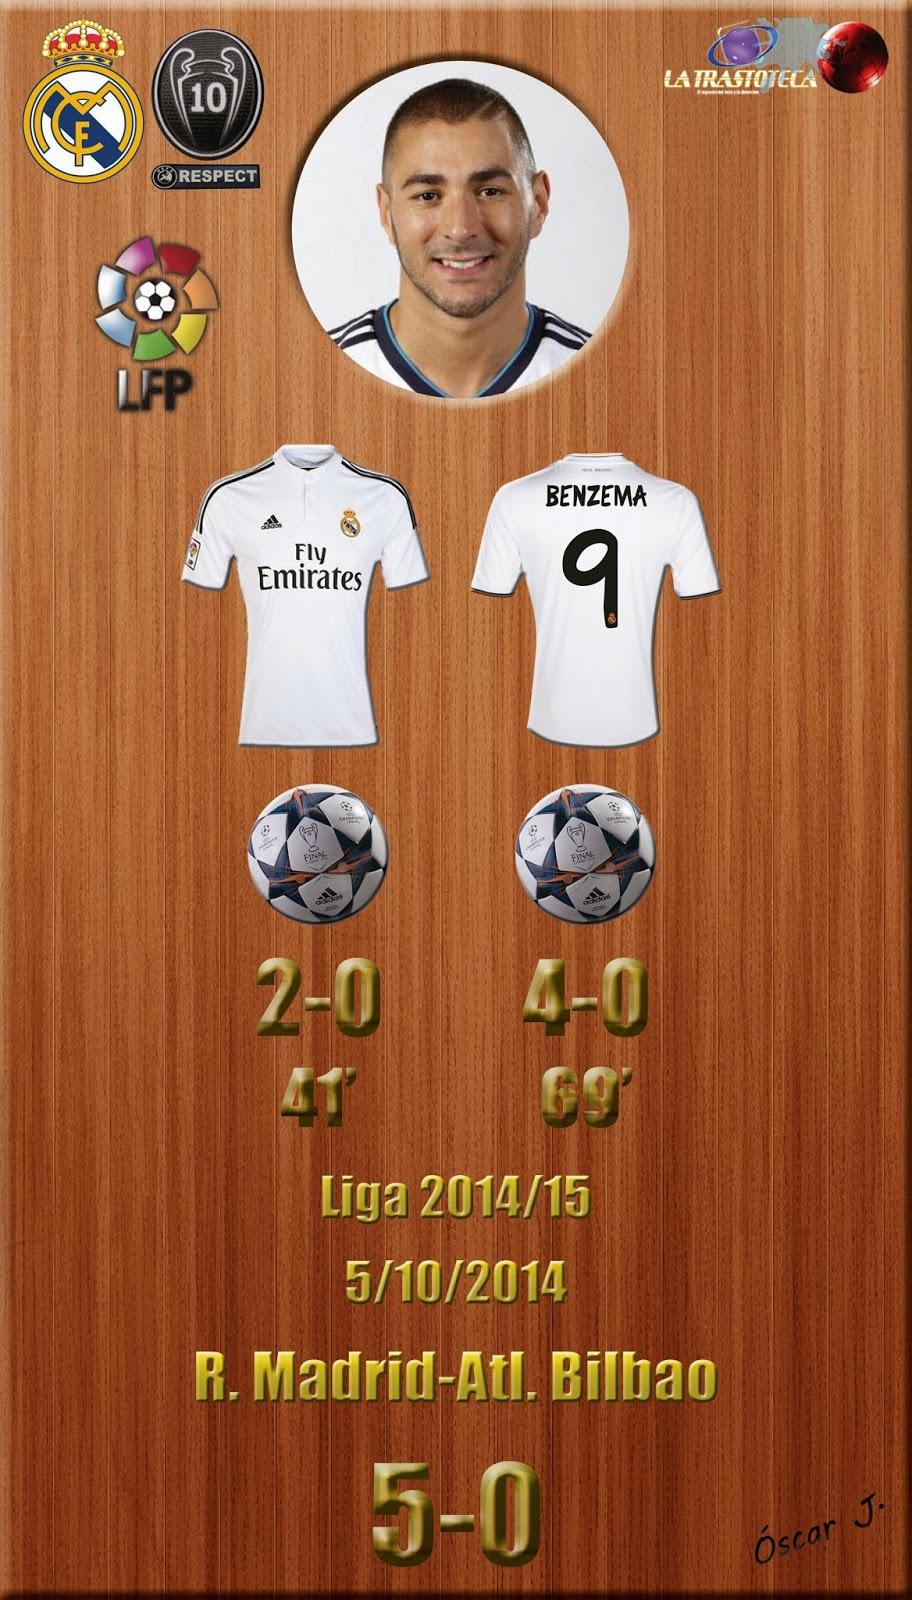 Benzema - Doblete - Real Madrid 5-0 Atletic Bilbao - Liga 2014/15 - (5/10/2014)